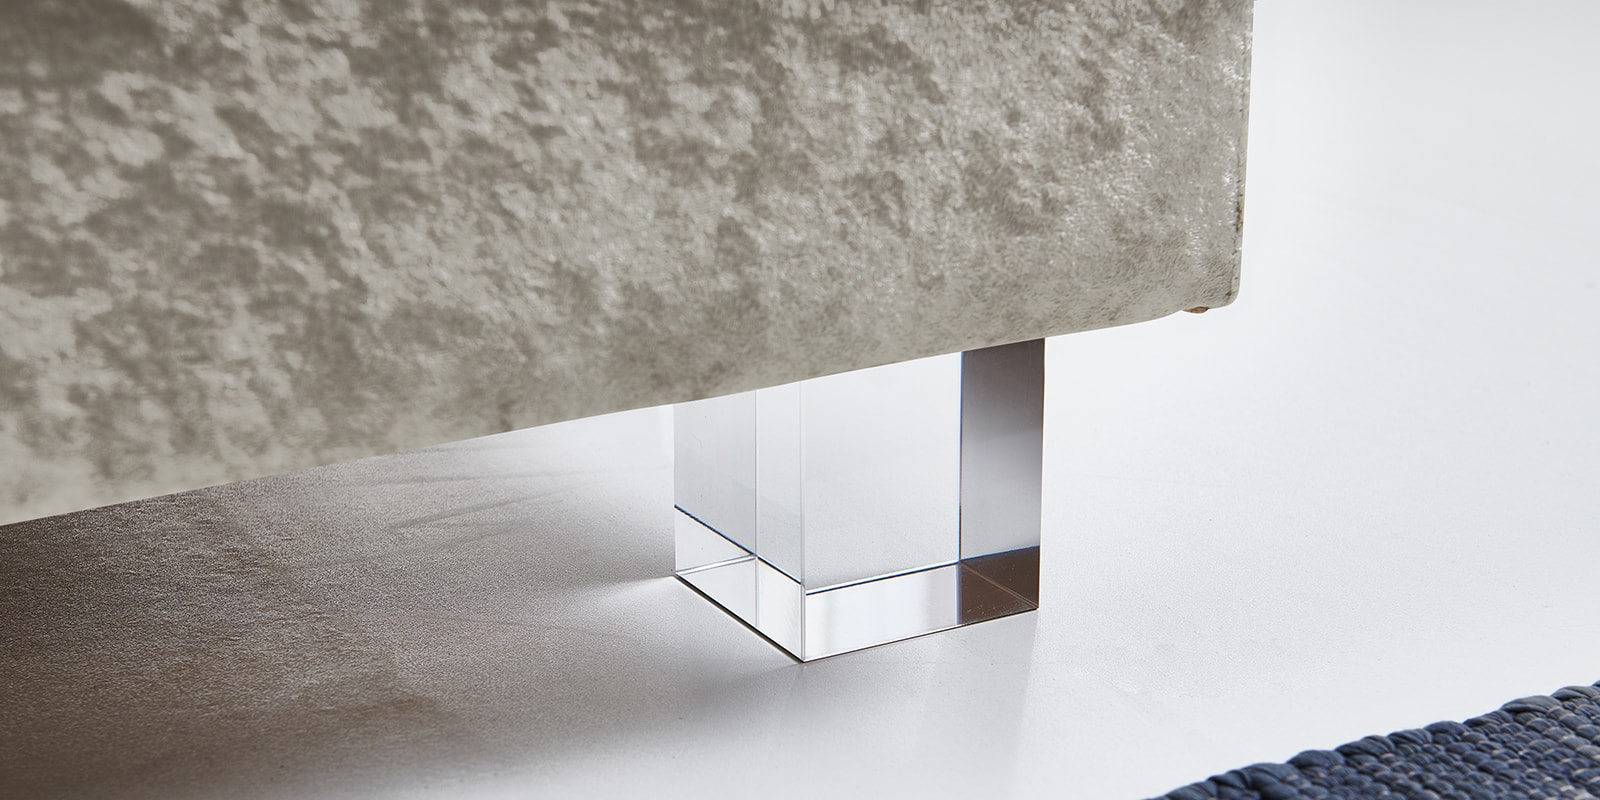 Moebella24 - Boxspringbett - Beige - Samt - Acryl Füße eckig - Glas Optik